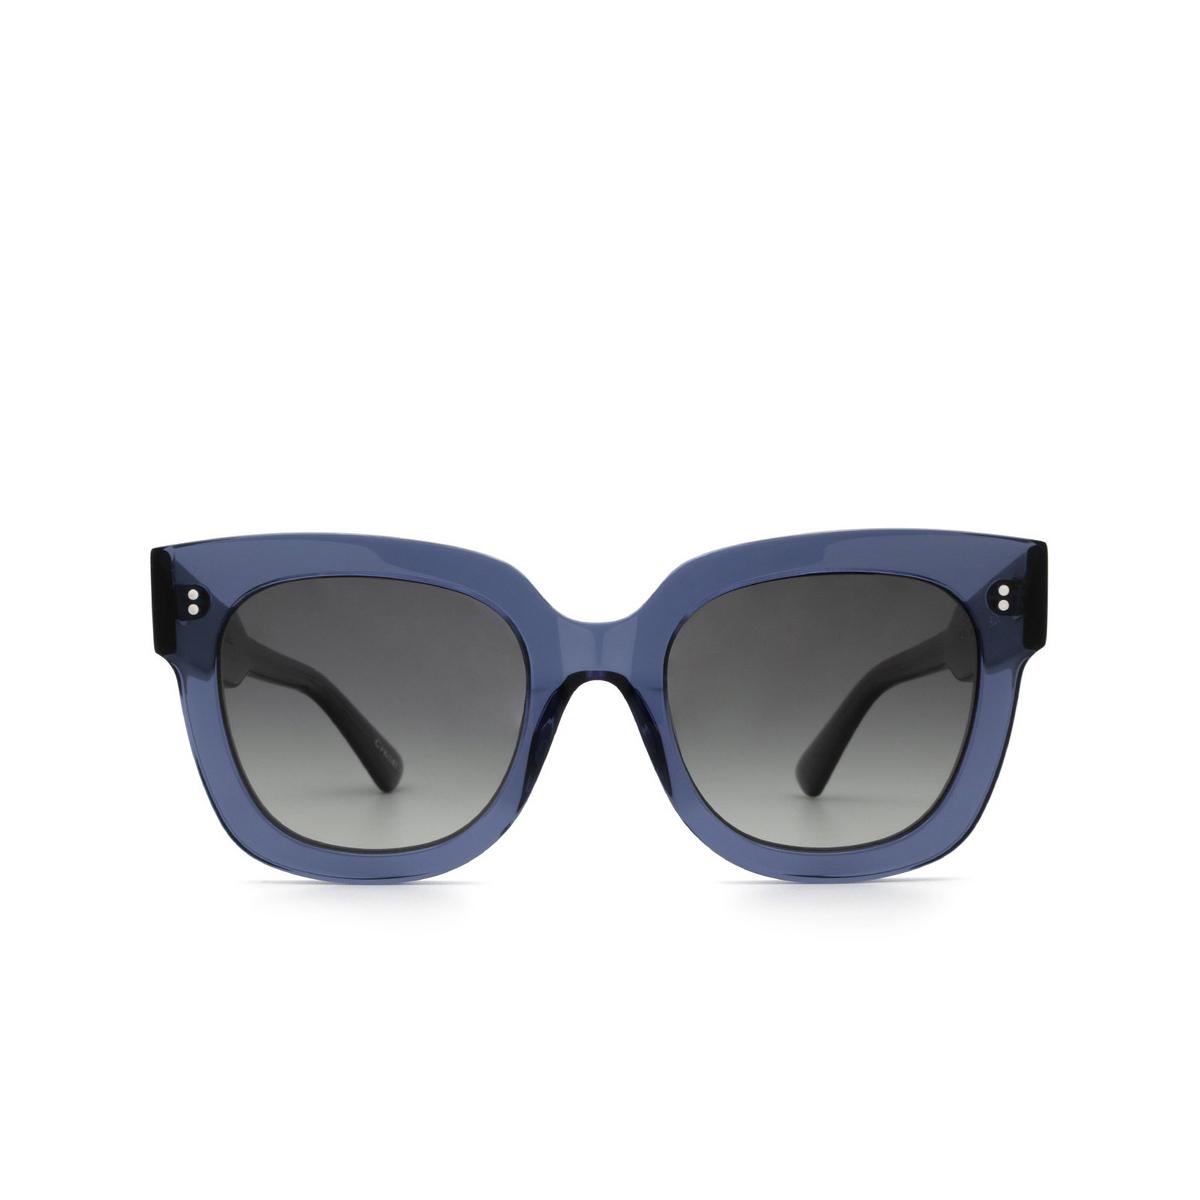 Chimi® Square Sunglasses: 08 color Blue - front view.